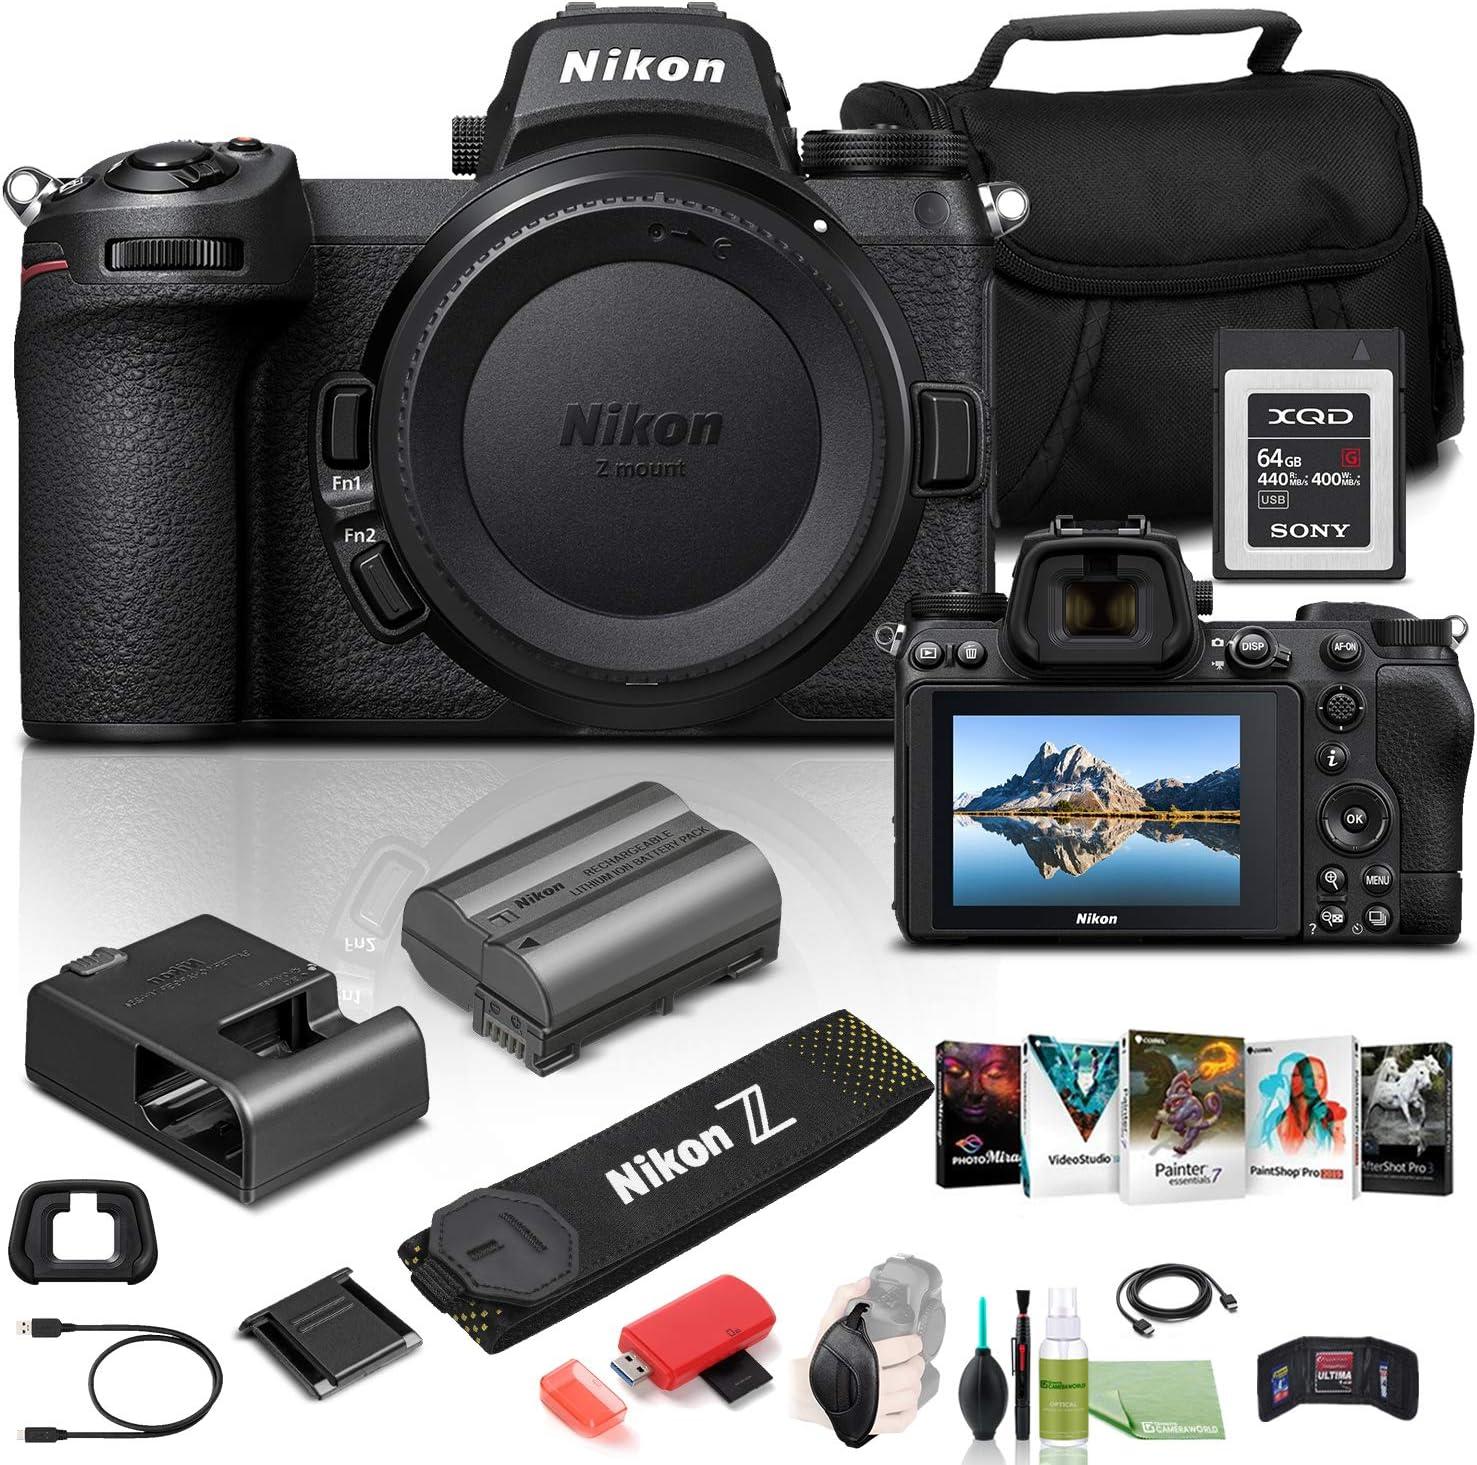 Nikon Z 6II Mirrorless Digital Camera 24.5MP (Body Only) (1659) USA Model + 64GB XQD Card + Corel Photo Software + Case + HDMI Cable + Card Reader + Hand Strap + More